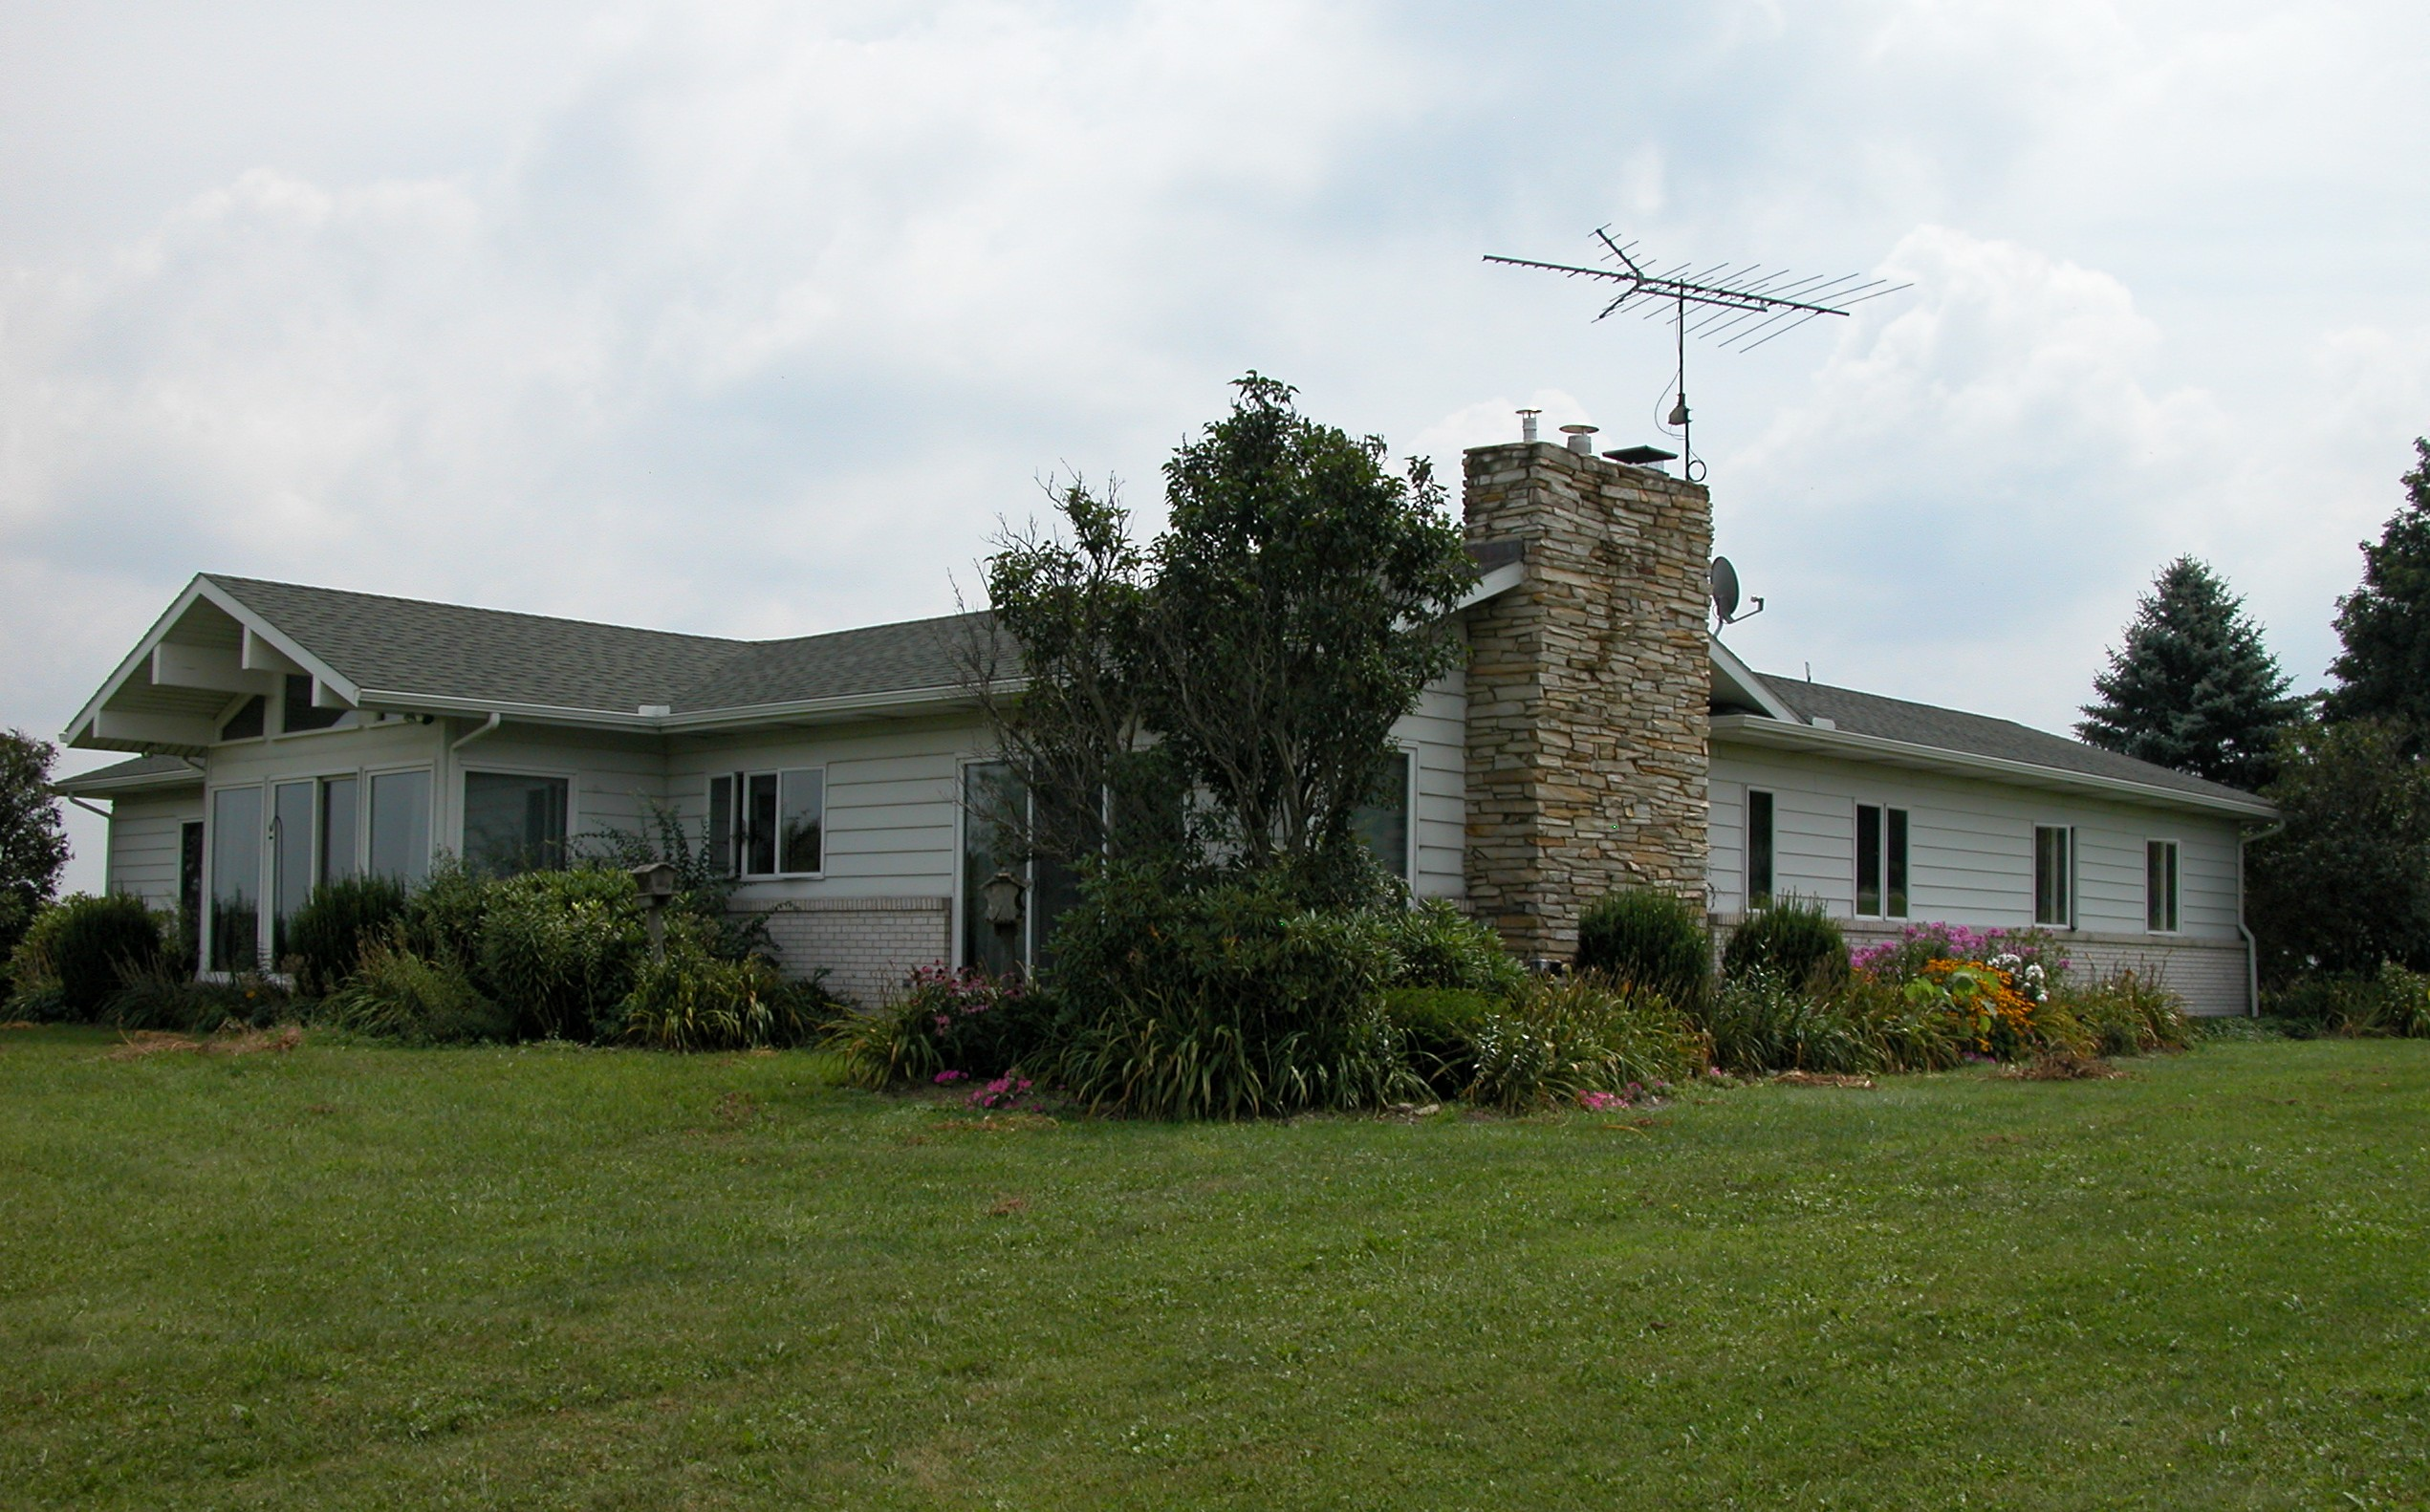 12381 Fry Rd, Edinboro, Pennsylvania 16412